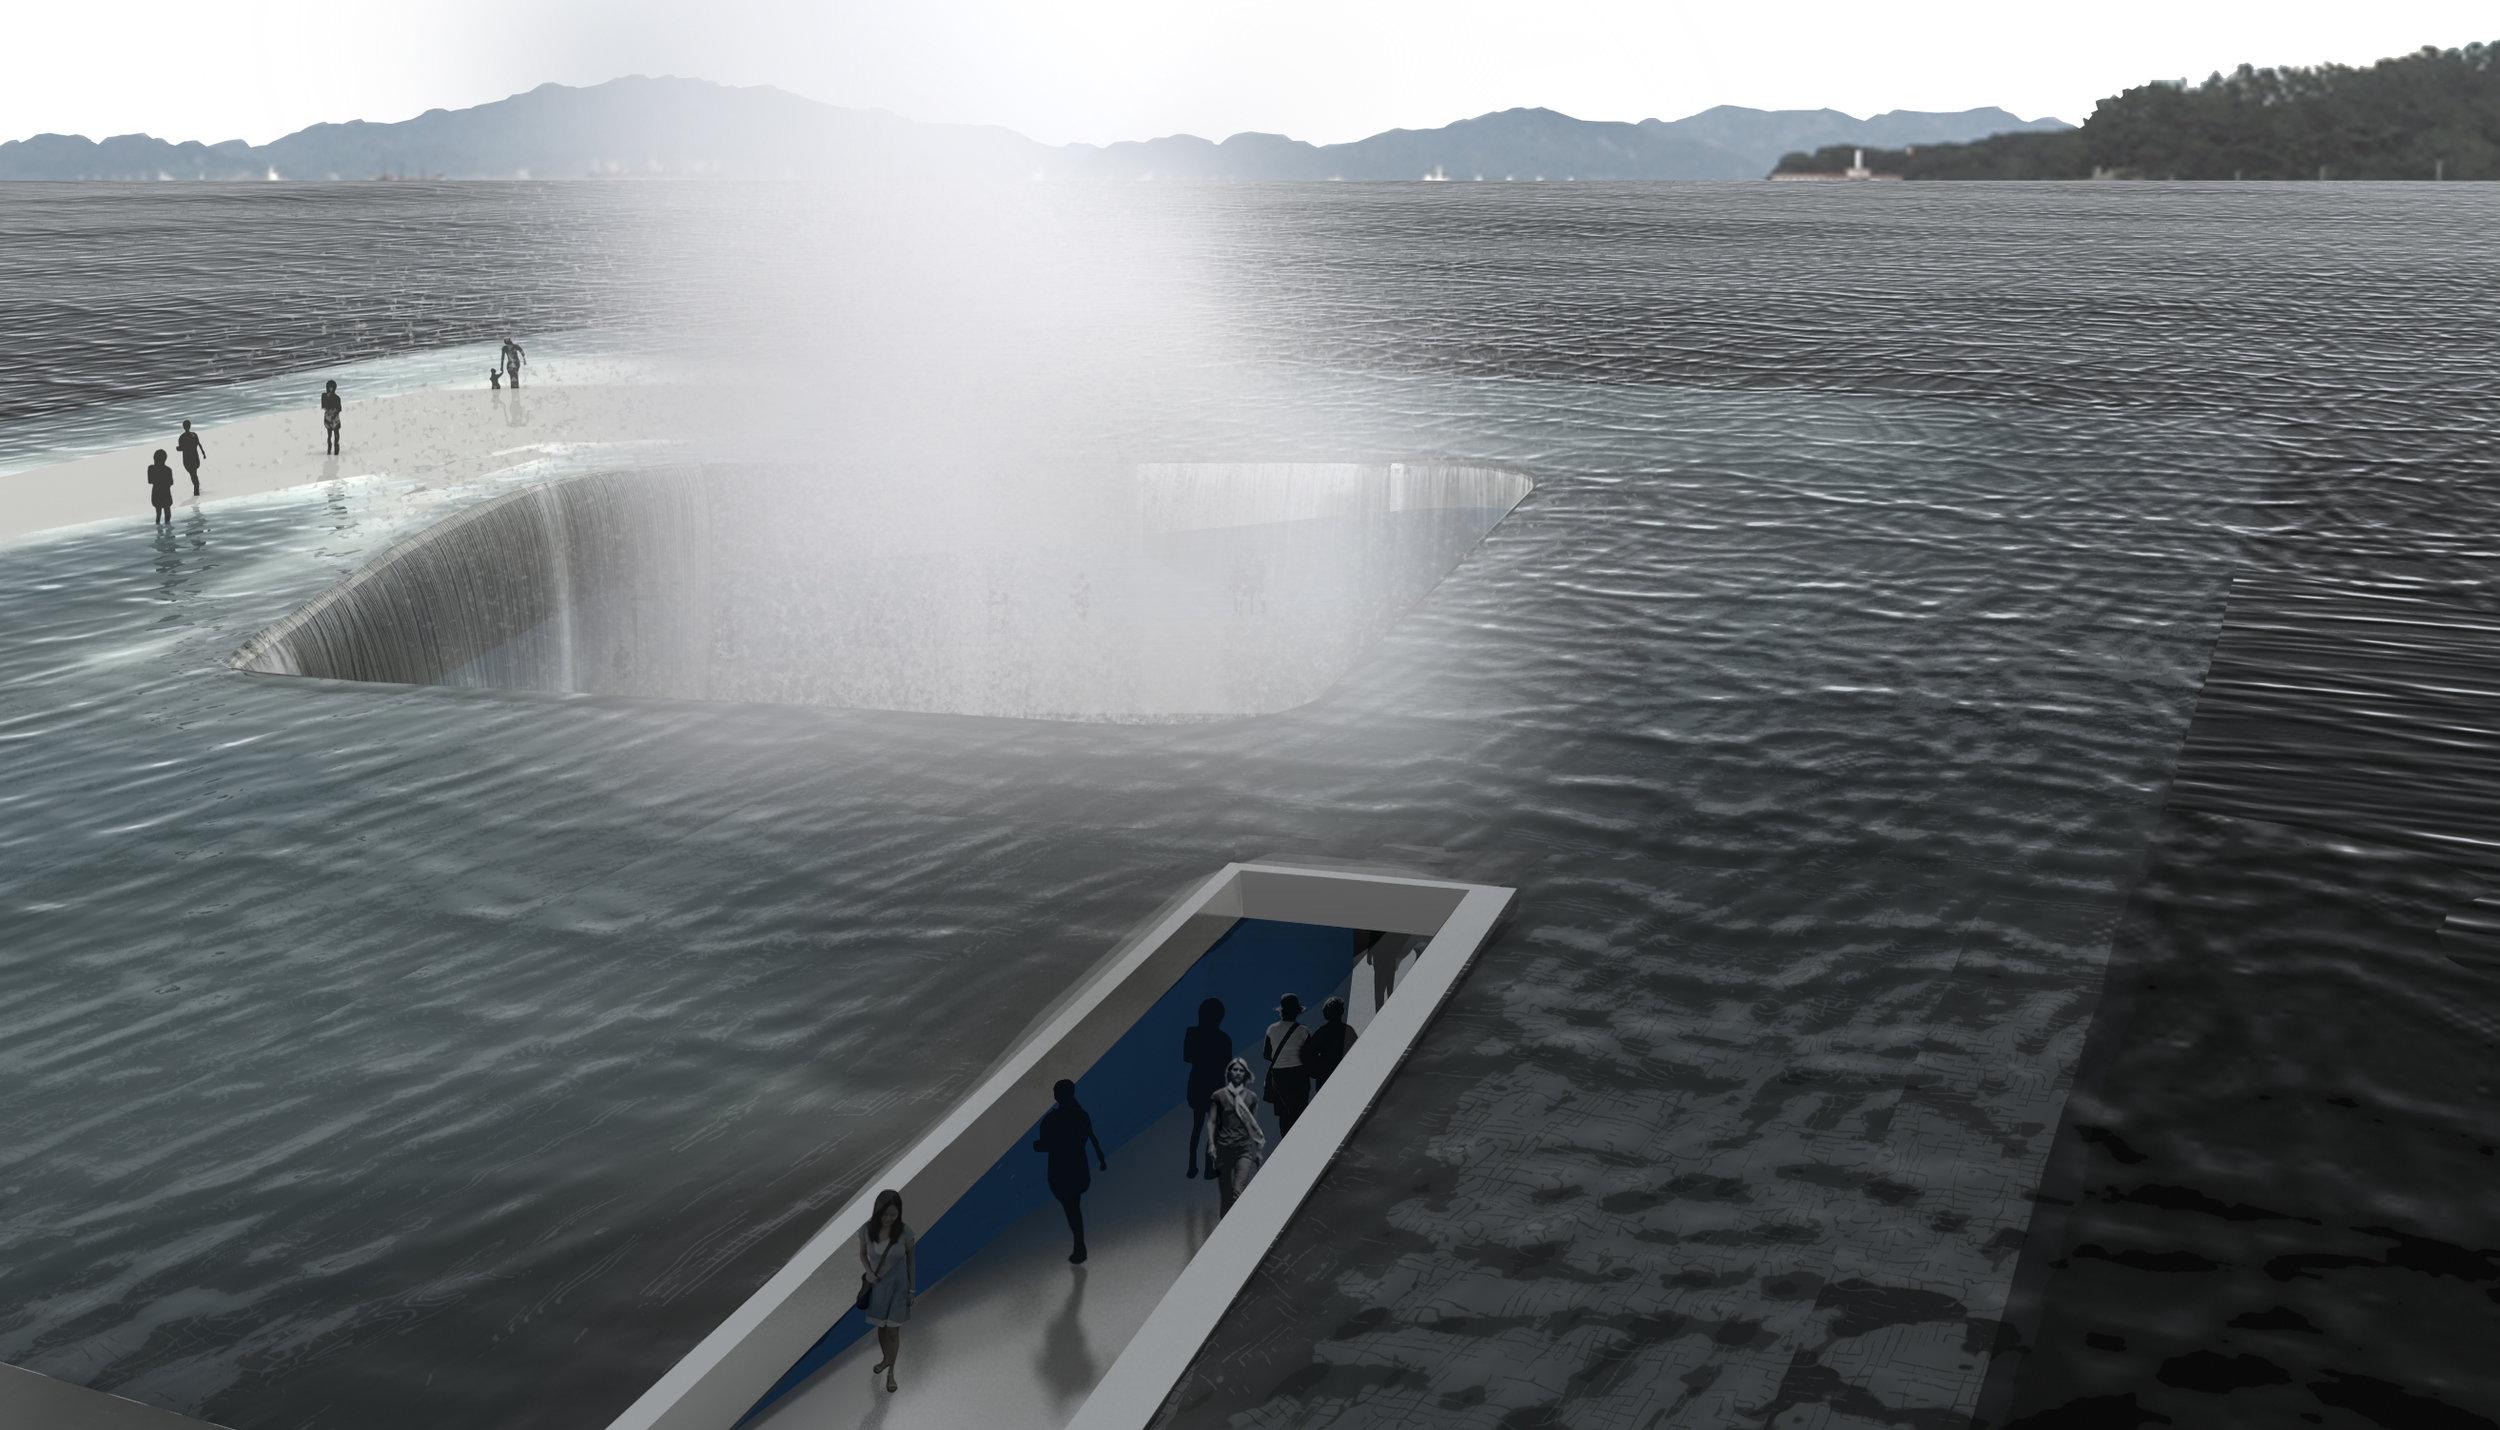 ©Daniel Vale - Water Pavilion: Walk towards the ocean